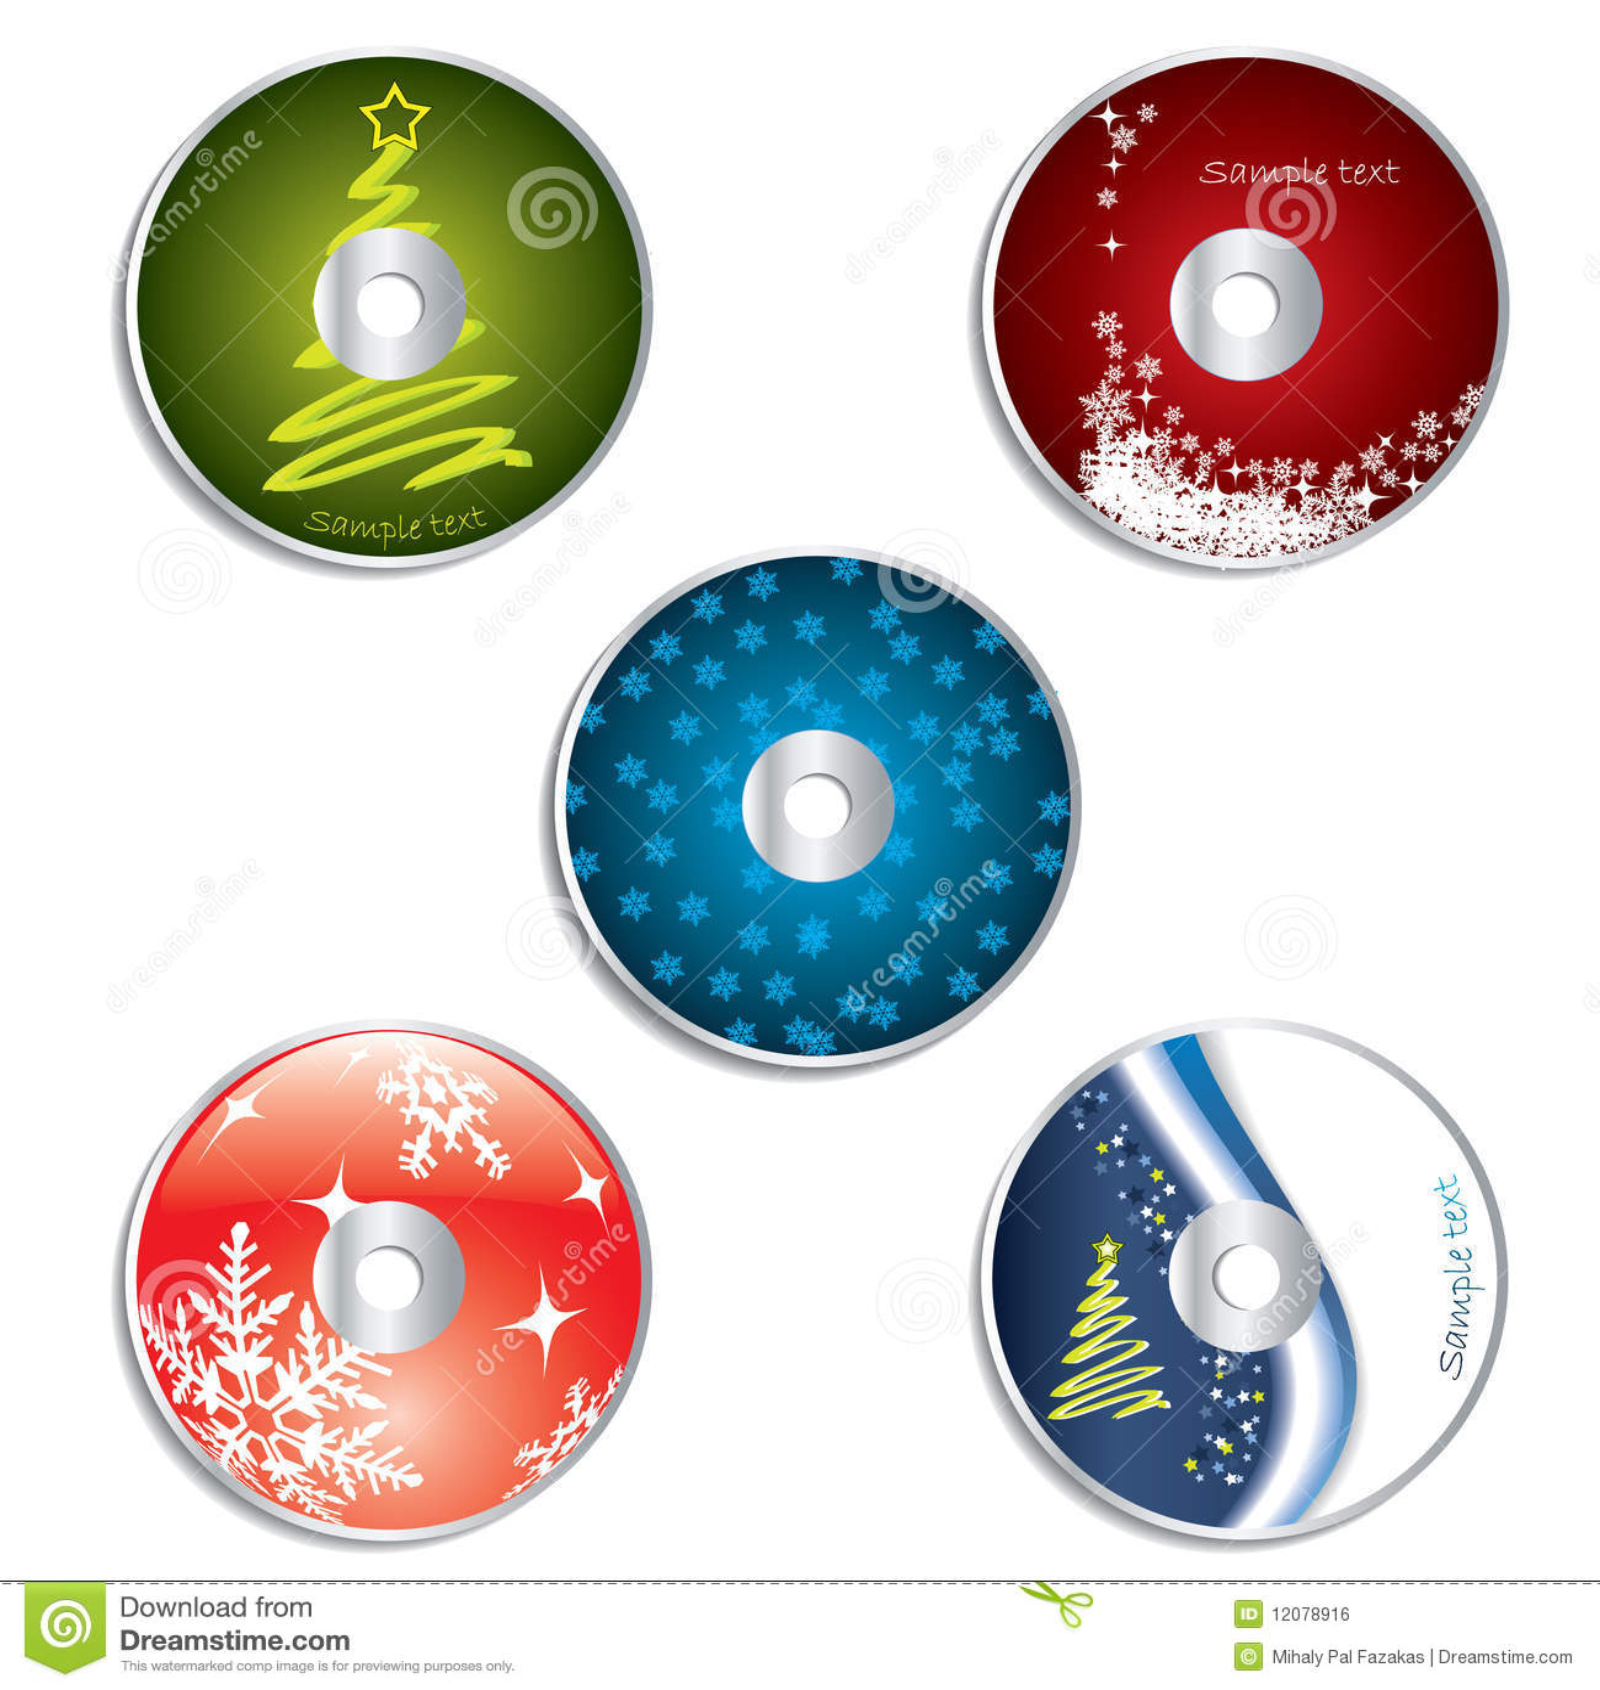 cd dvd label christmas designs 2 stock vector illustration of